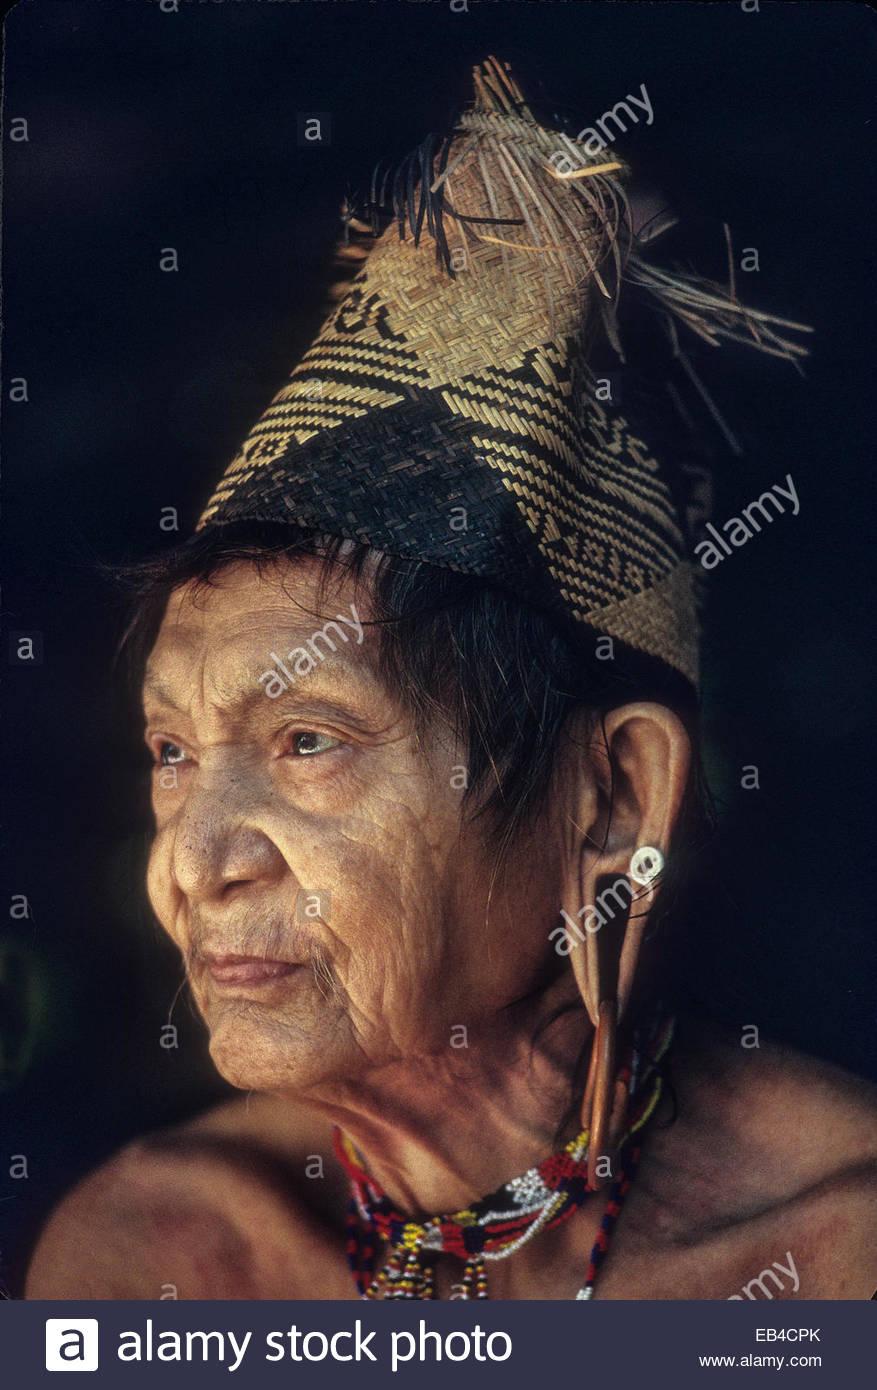 A Penan elder with a woven hat and an ear deformed by wearing heavy earrings,. - Stock Image